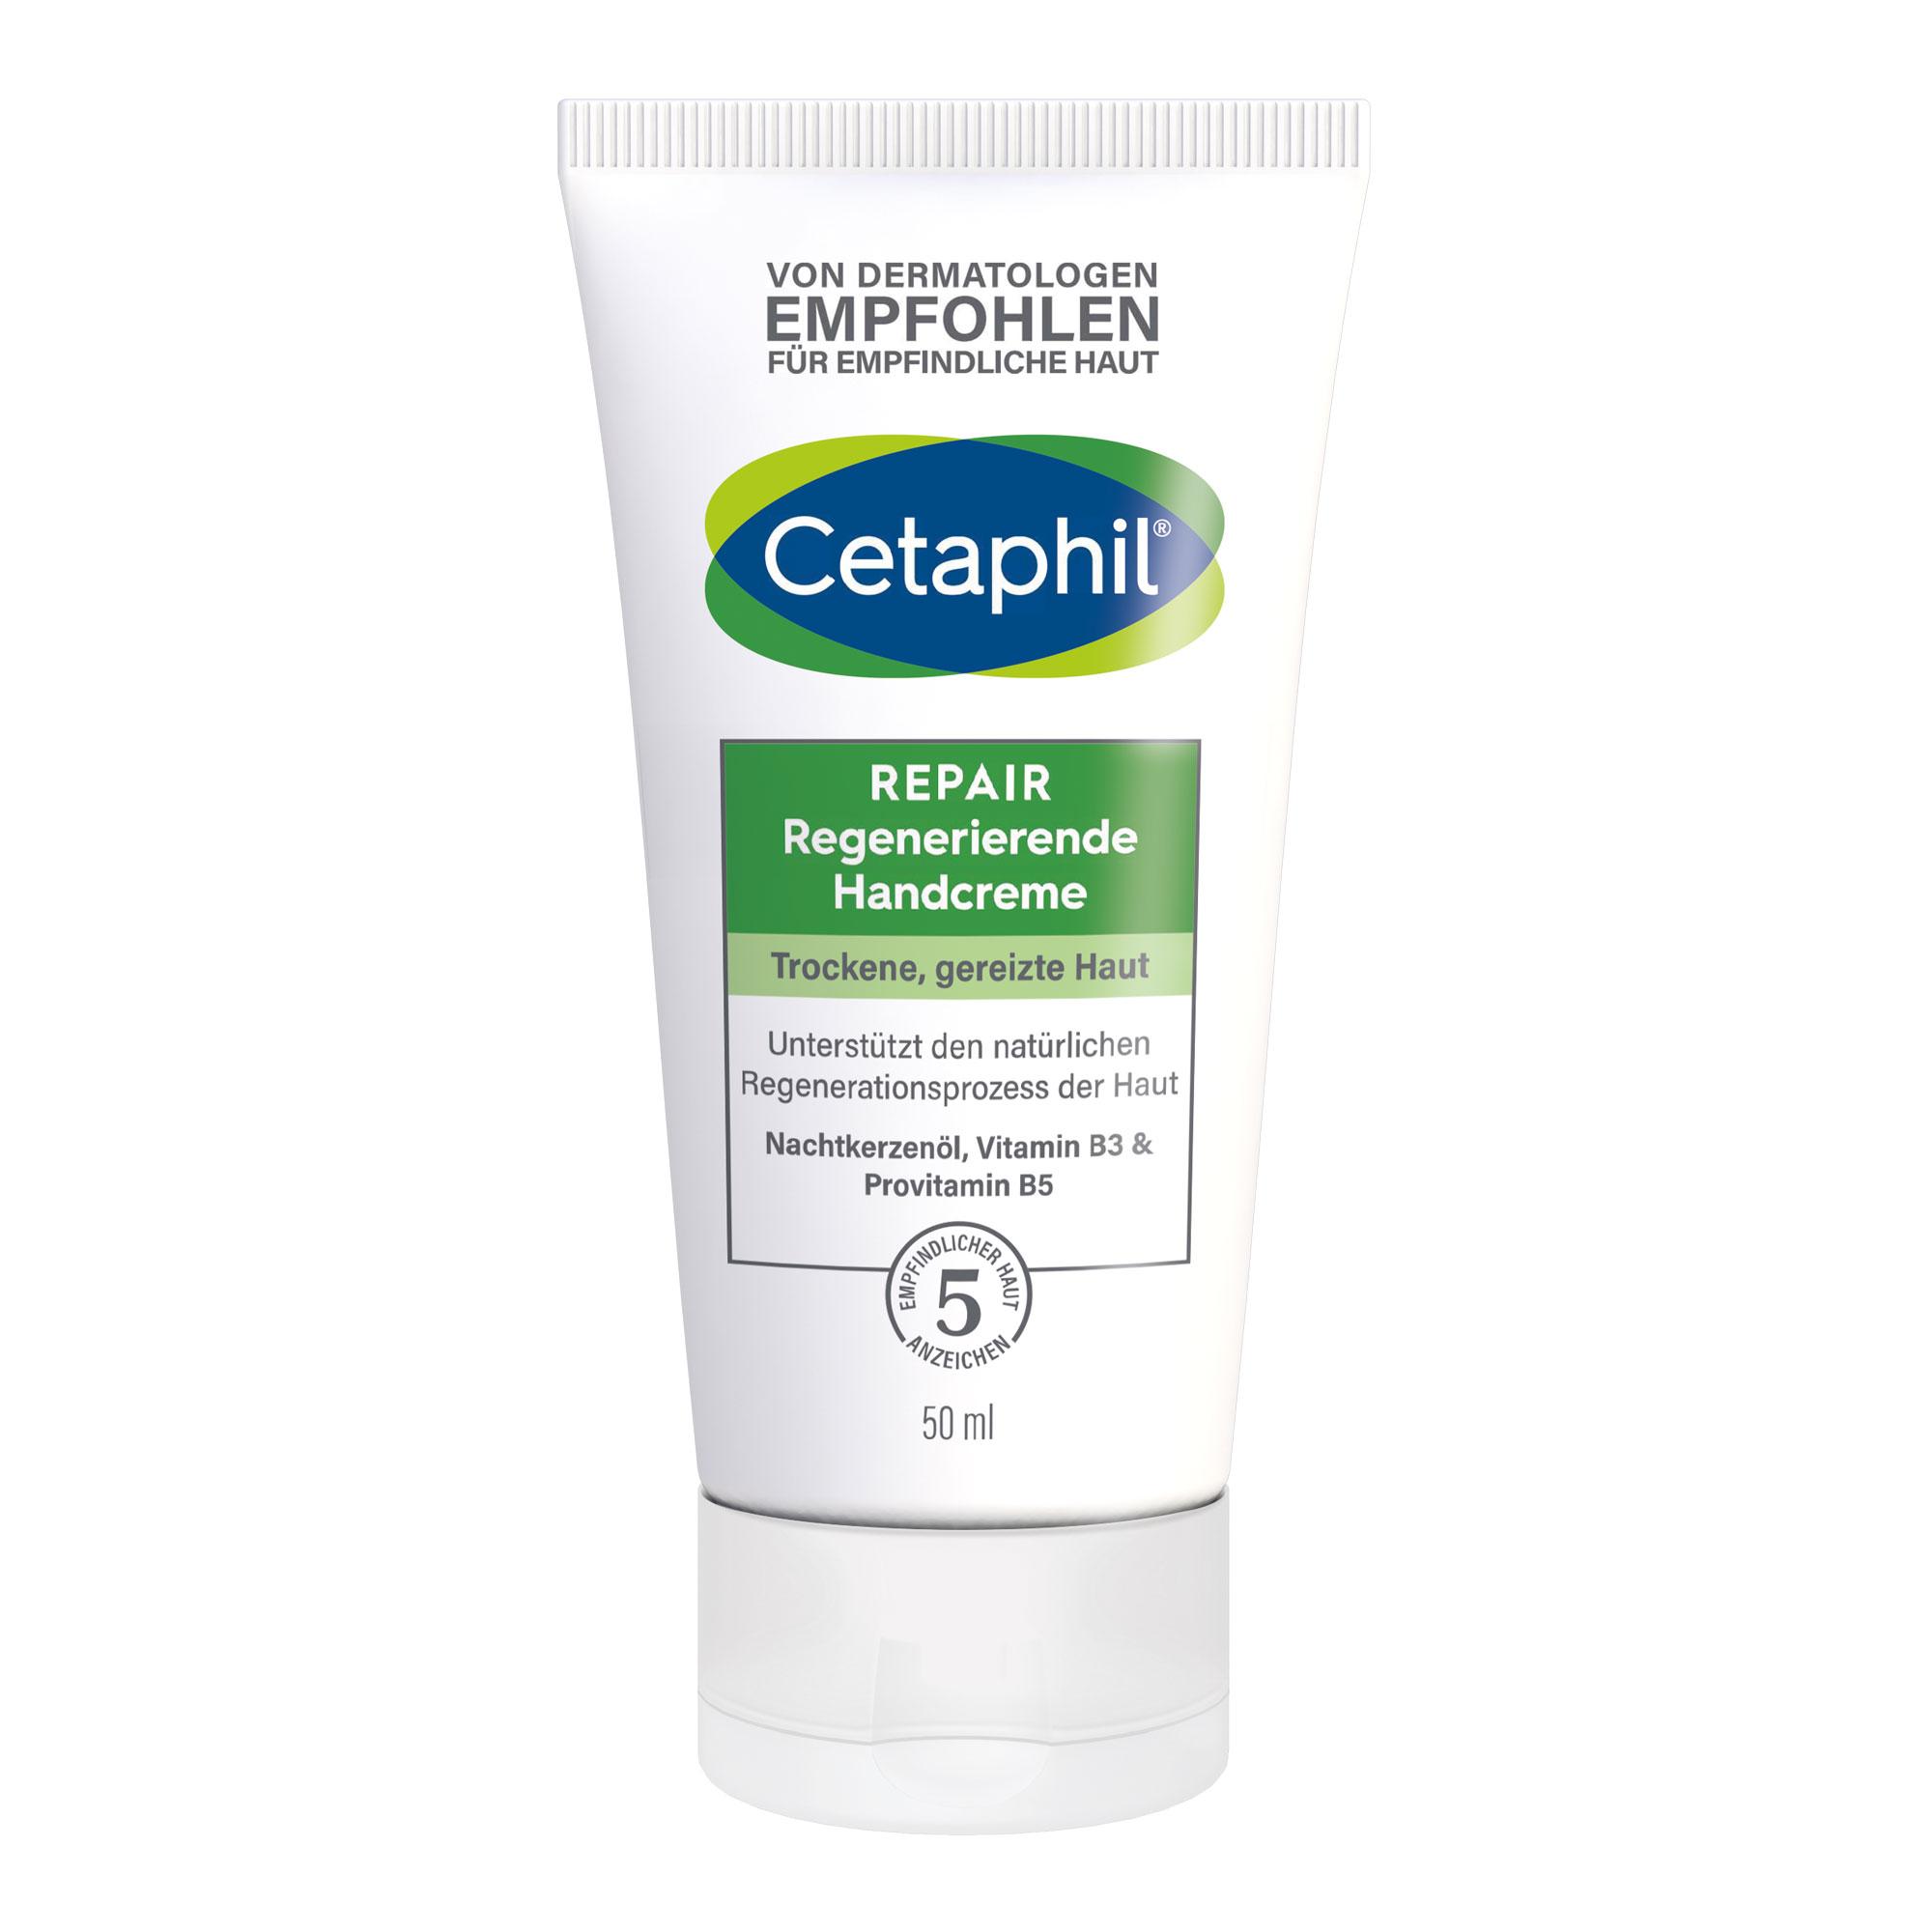 Cetaphil Repair Handcreme